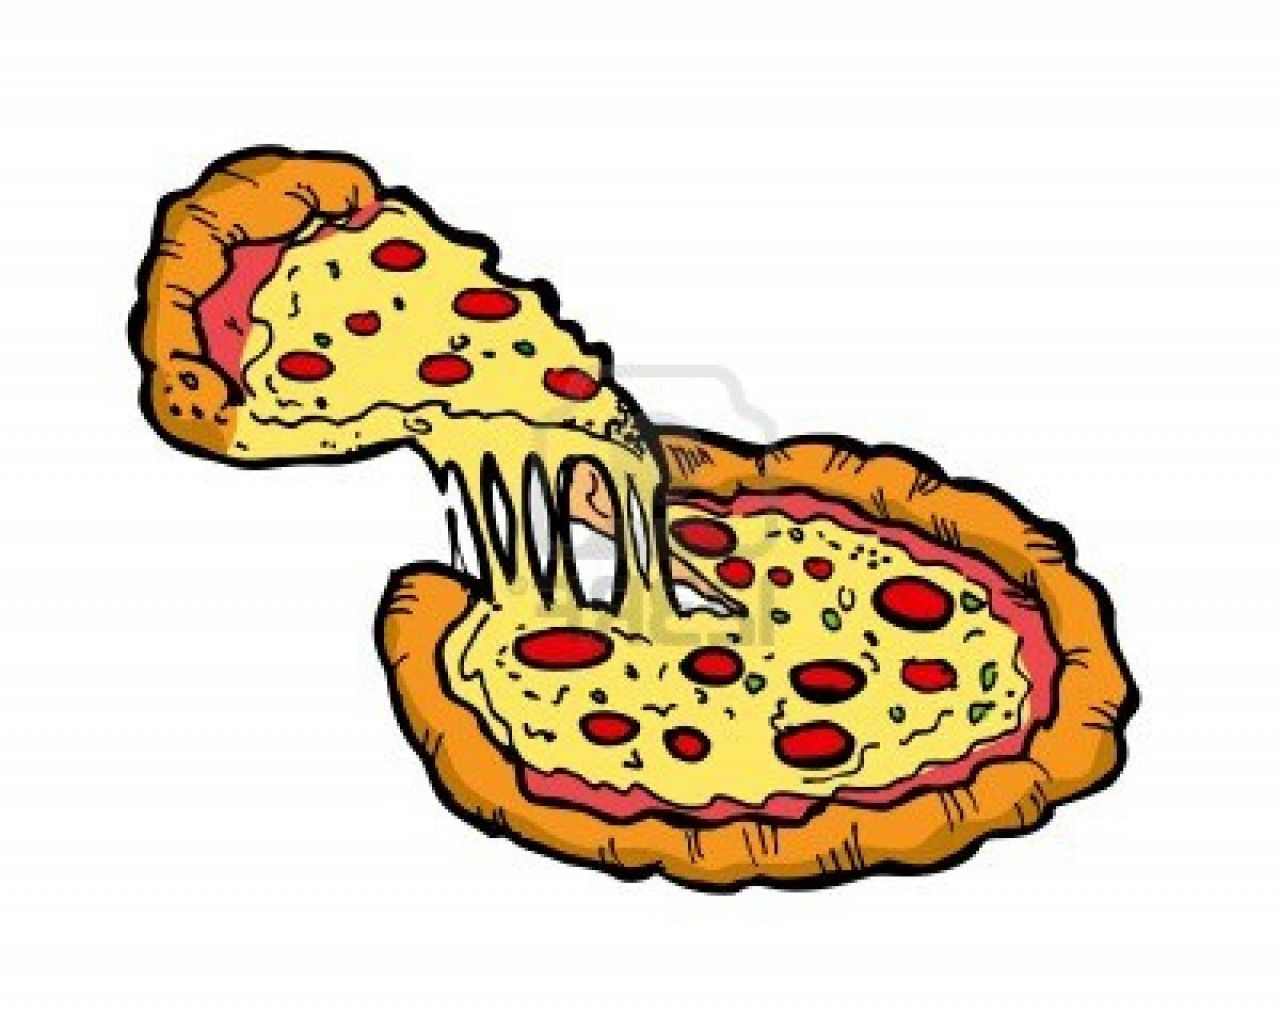 1280x1014 Pepperoni Pizza Clipart